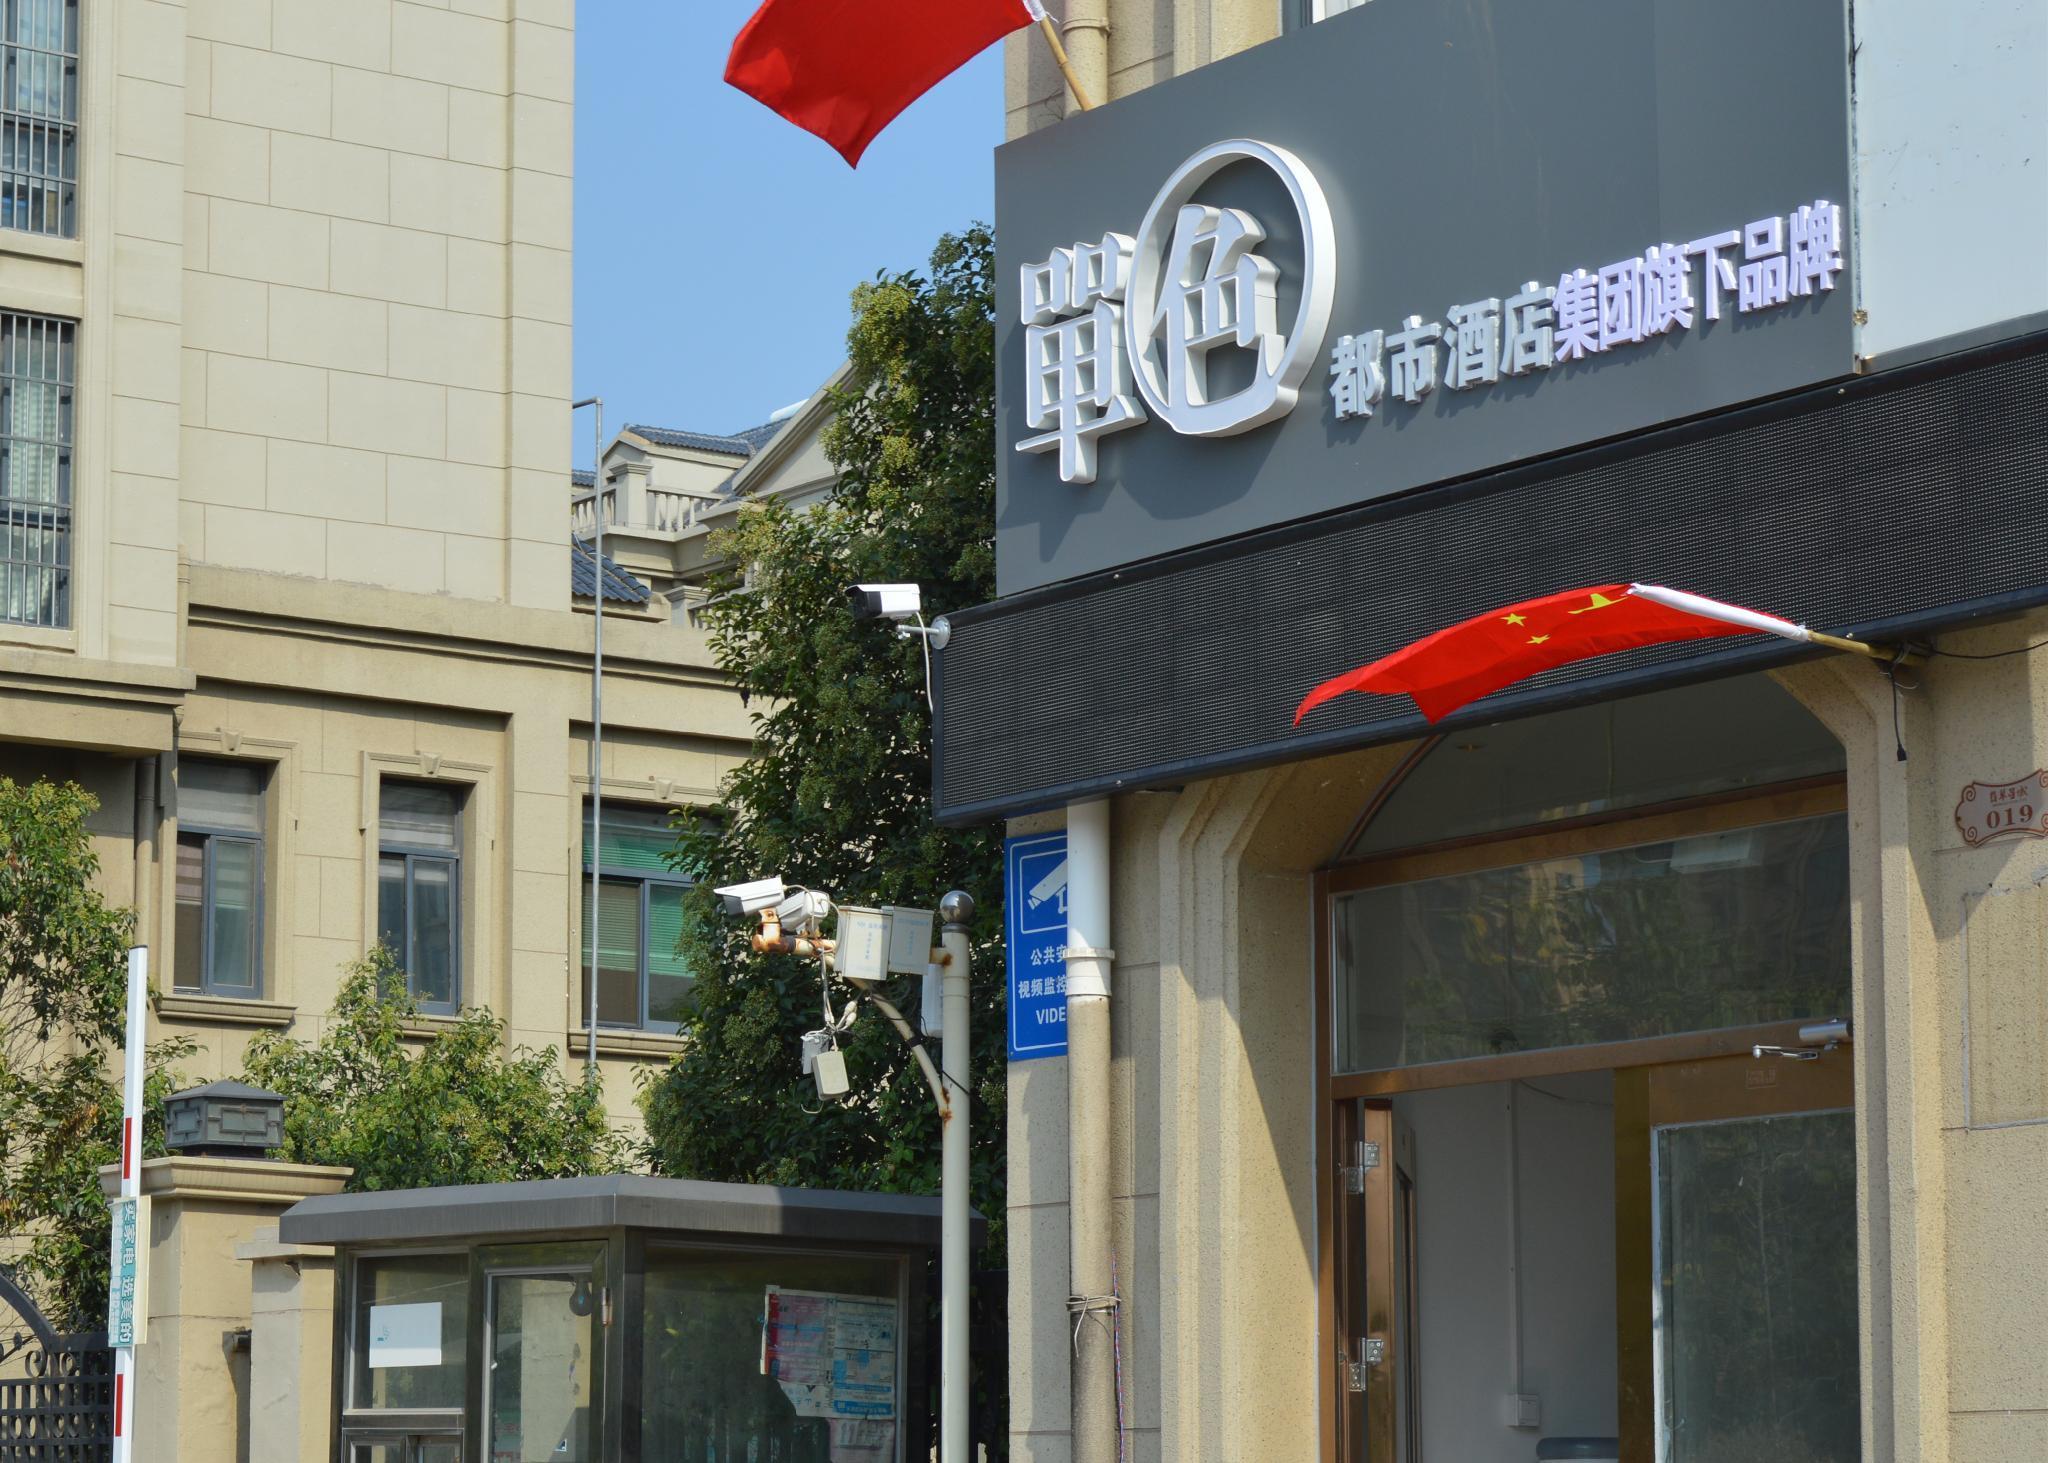 Monochrome Hotel Linshu Pedestrian Street